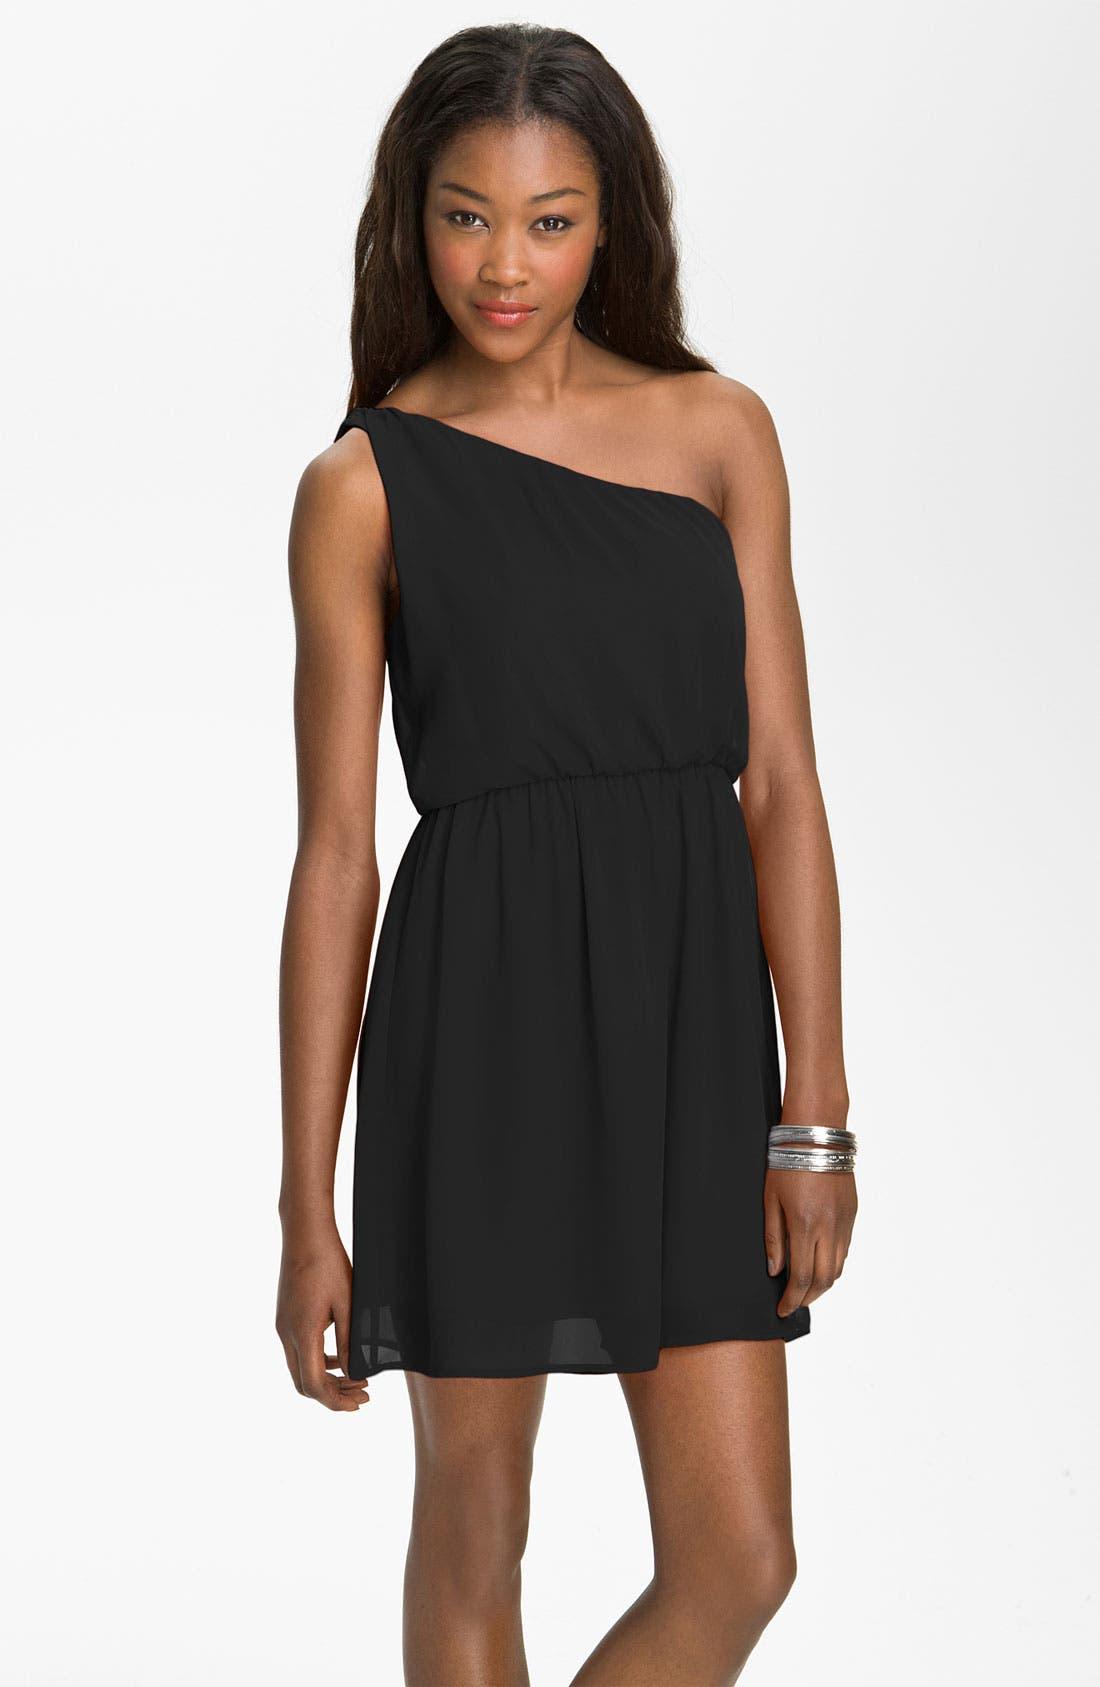 Alternate Image 1 Selected - Lush 'Caroline' One Shoulder Dress (Juniors)